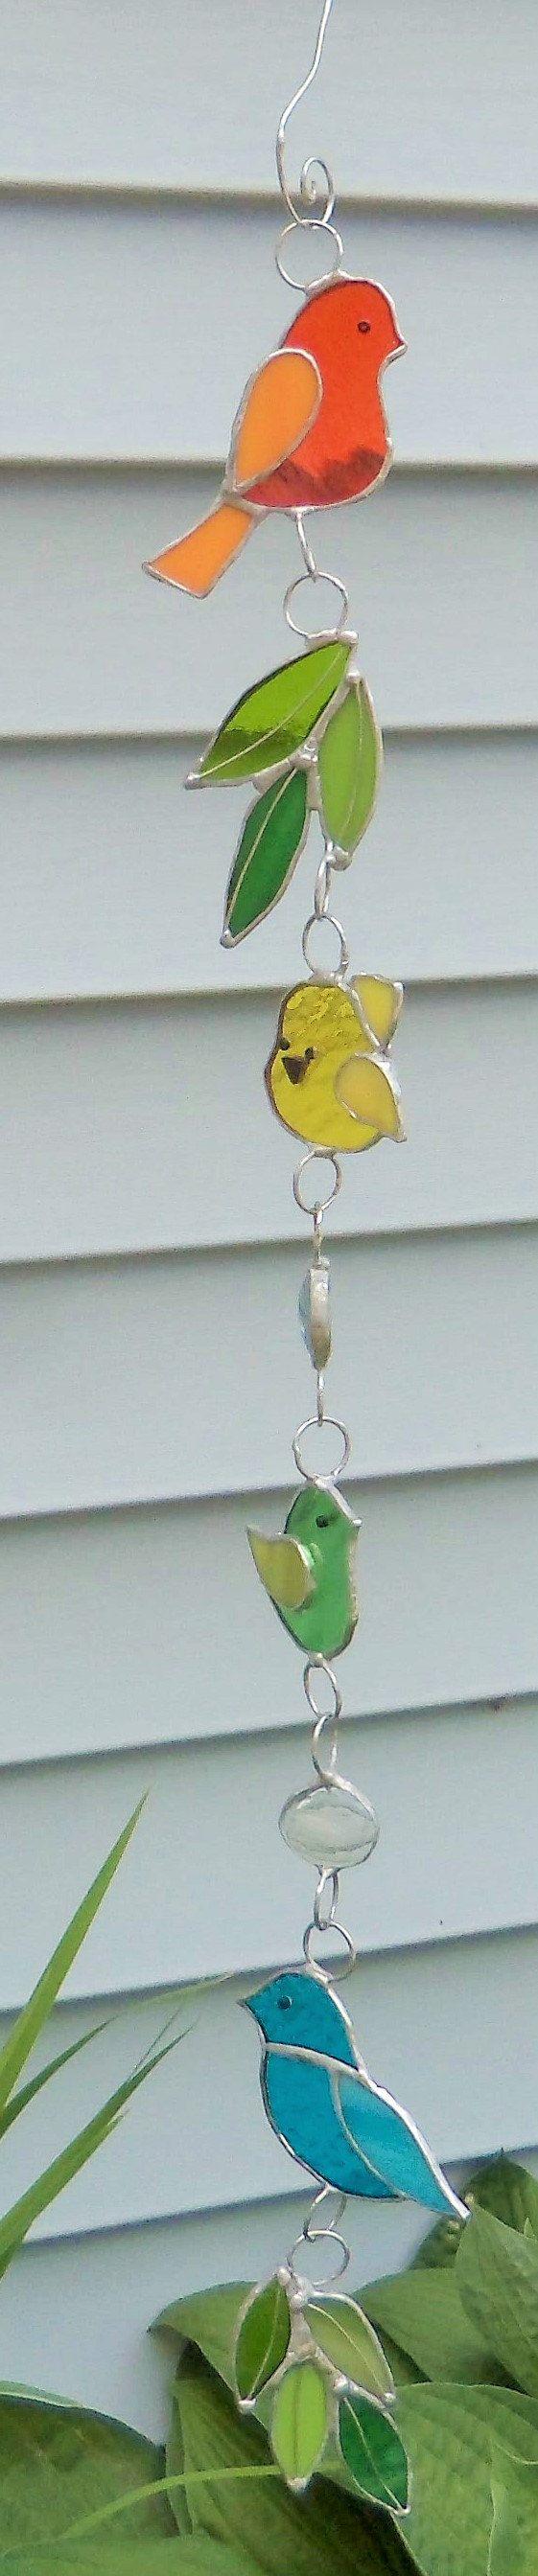 Vidrieras-aves-sol Catcher-Garland-Multi colores 31 pulgadas